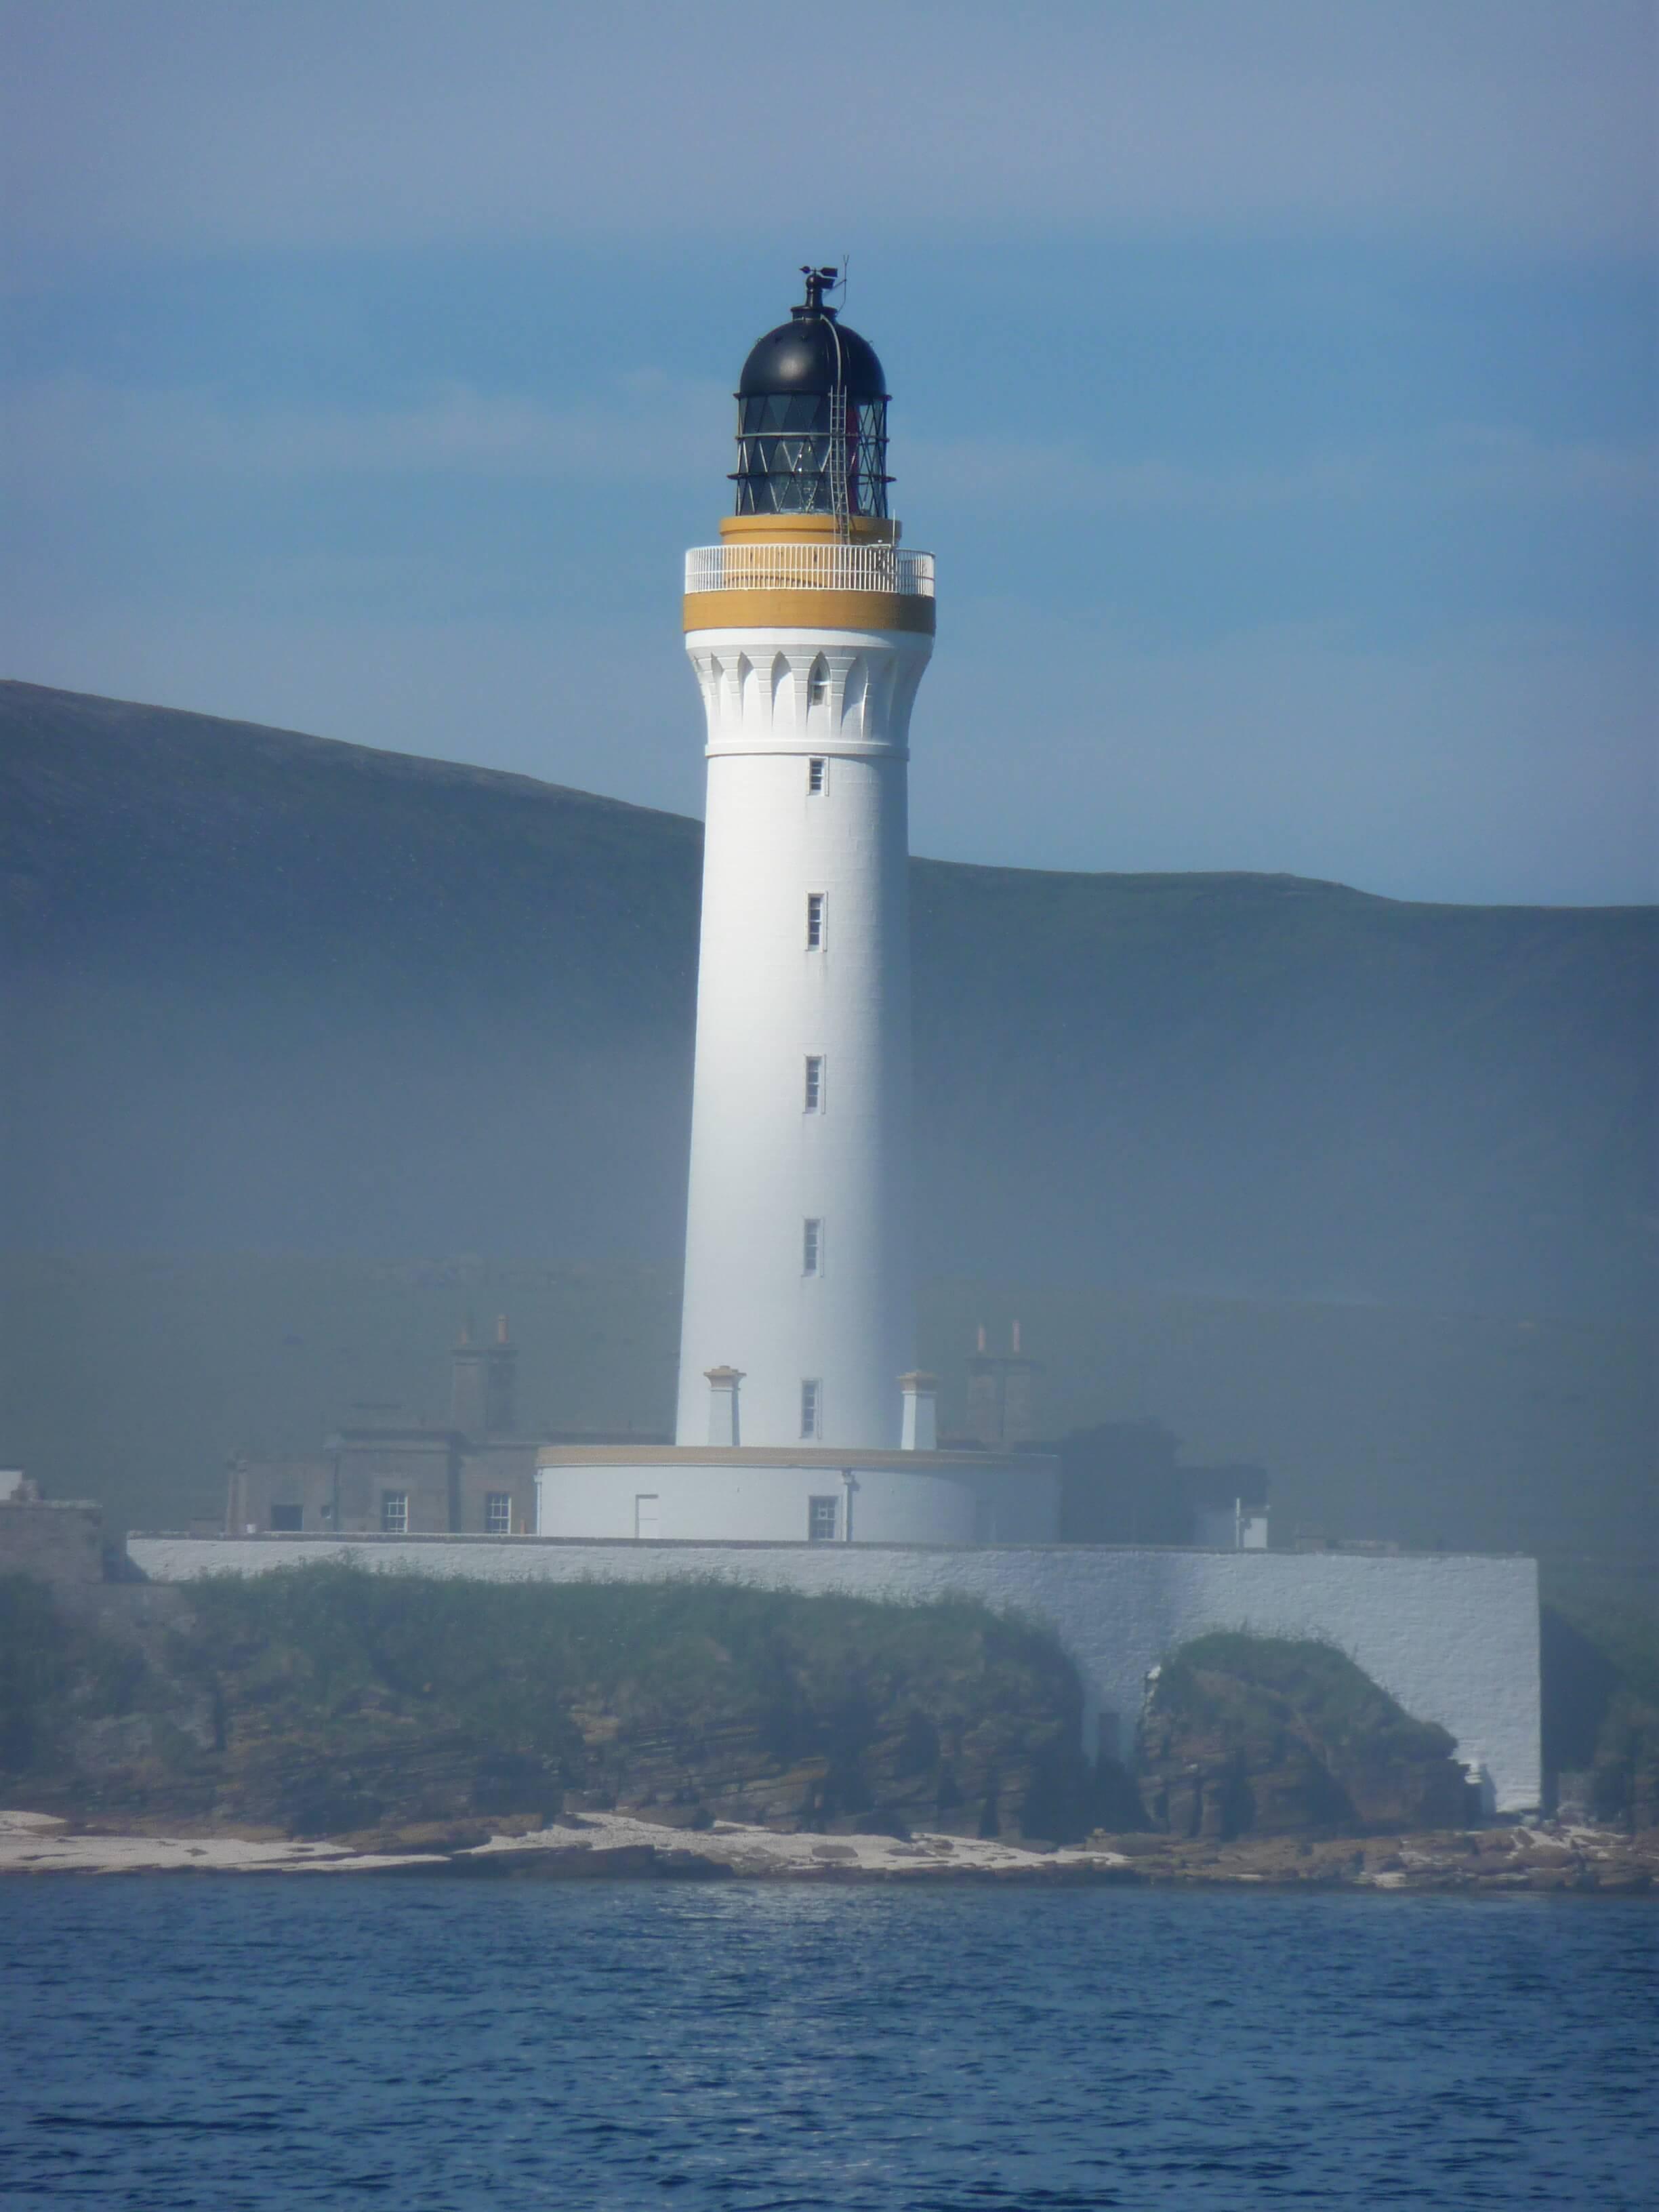 Hoy High lighthouse, island of Graemsay, Orkney, Scotland